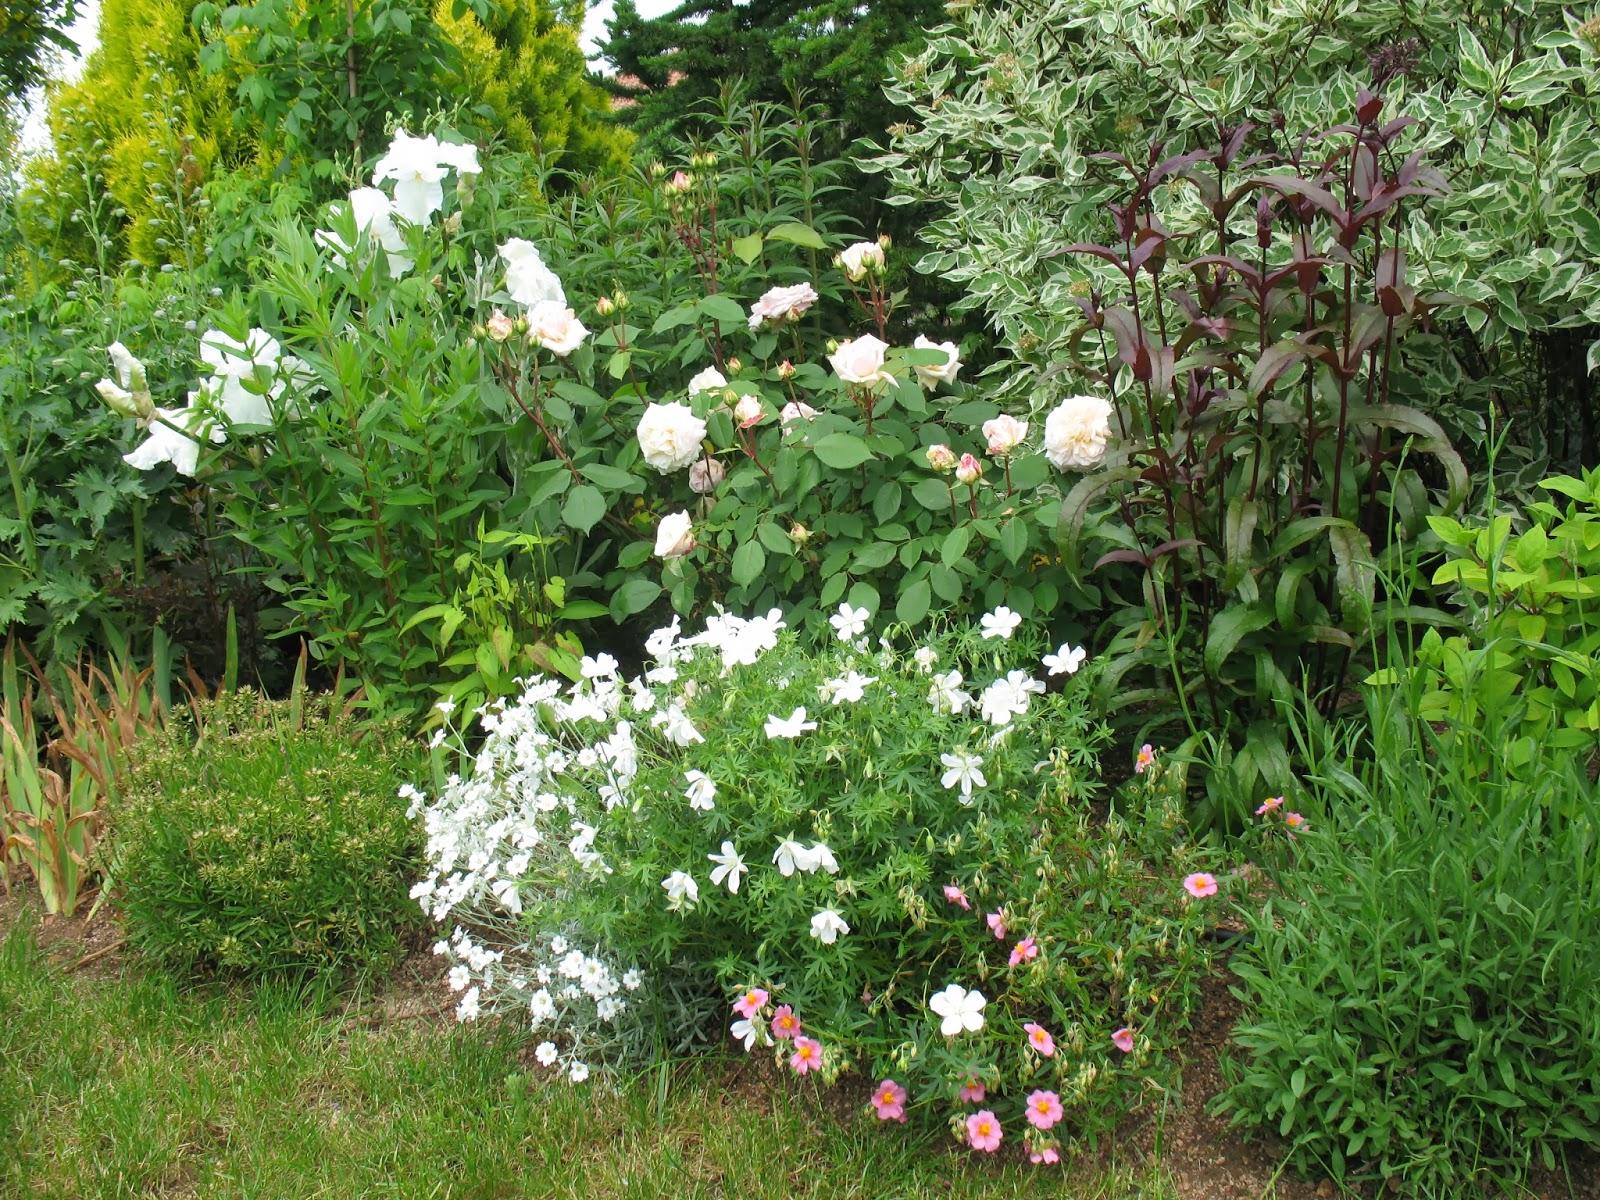 Roses du jardin ch neland penst mon digitalis husker red - Geranium feuilles qui jaunissent ...